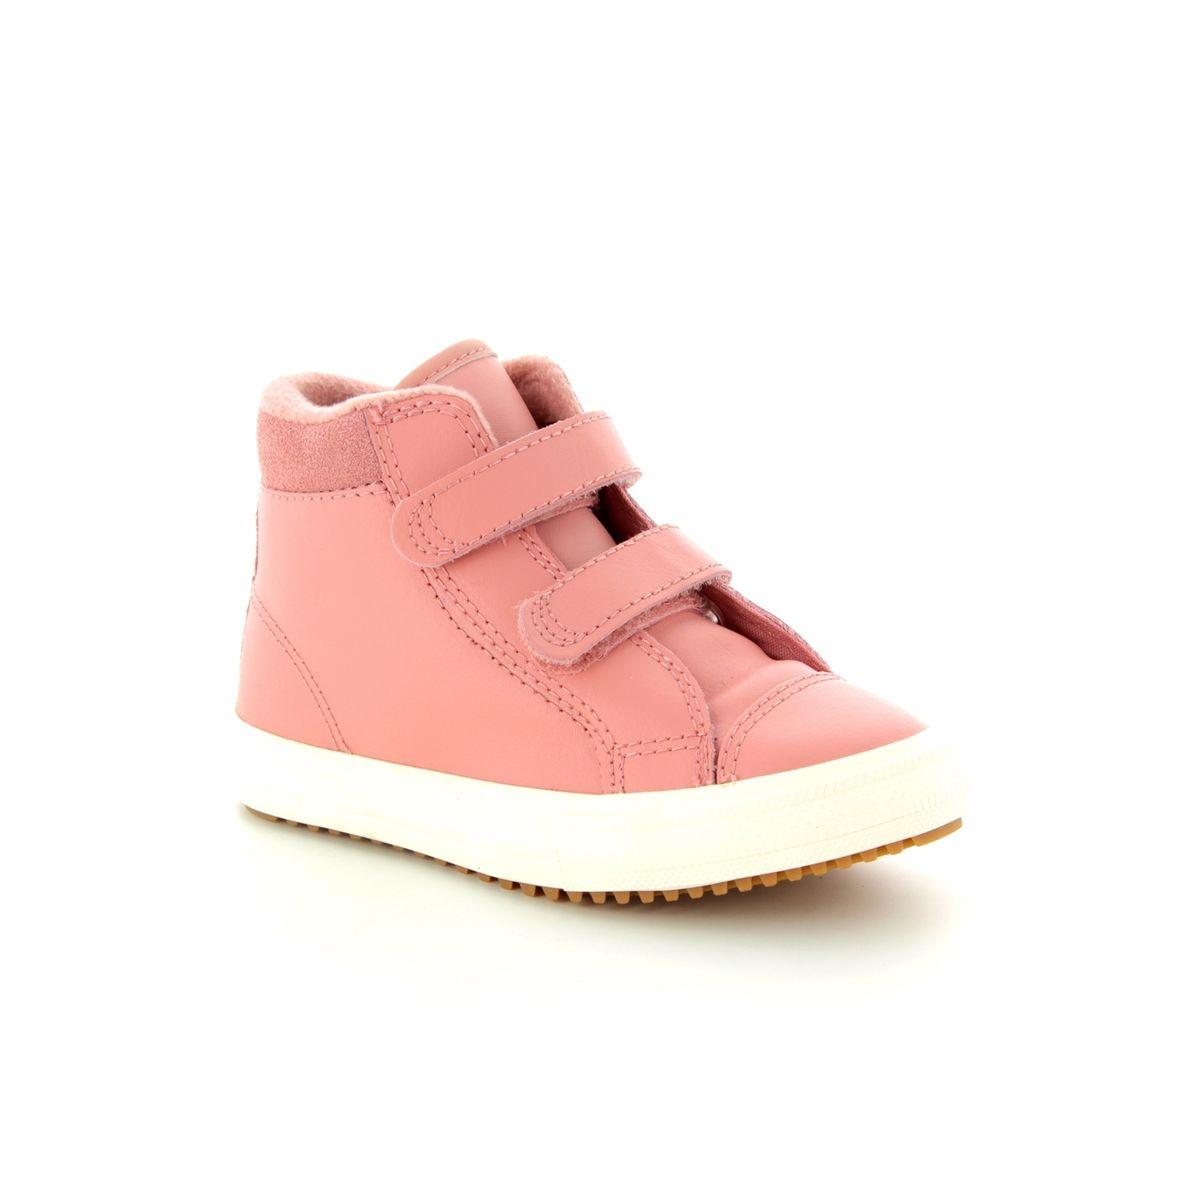 09a848fb65fd Converse Boots - Pink - 761980C ALLSTAR PC INF